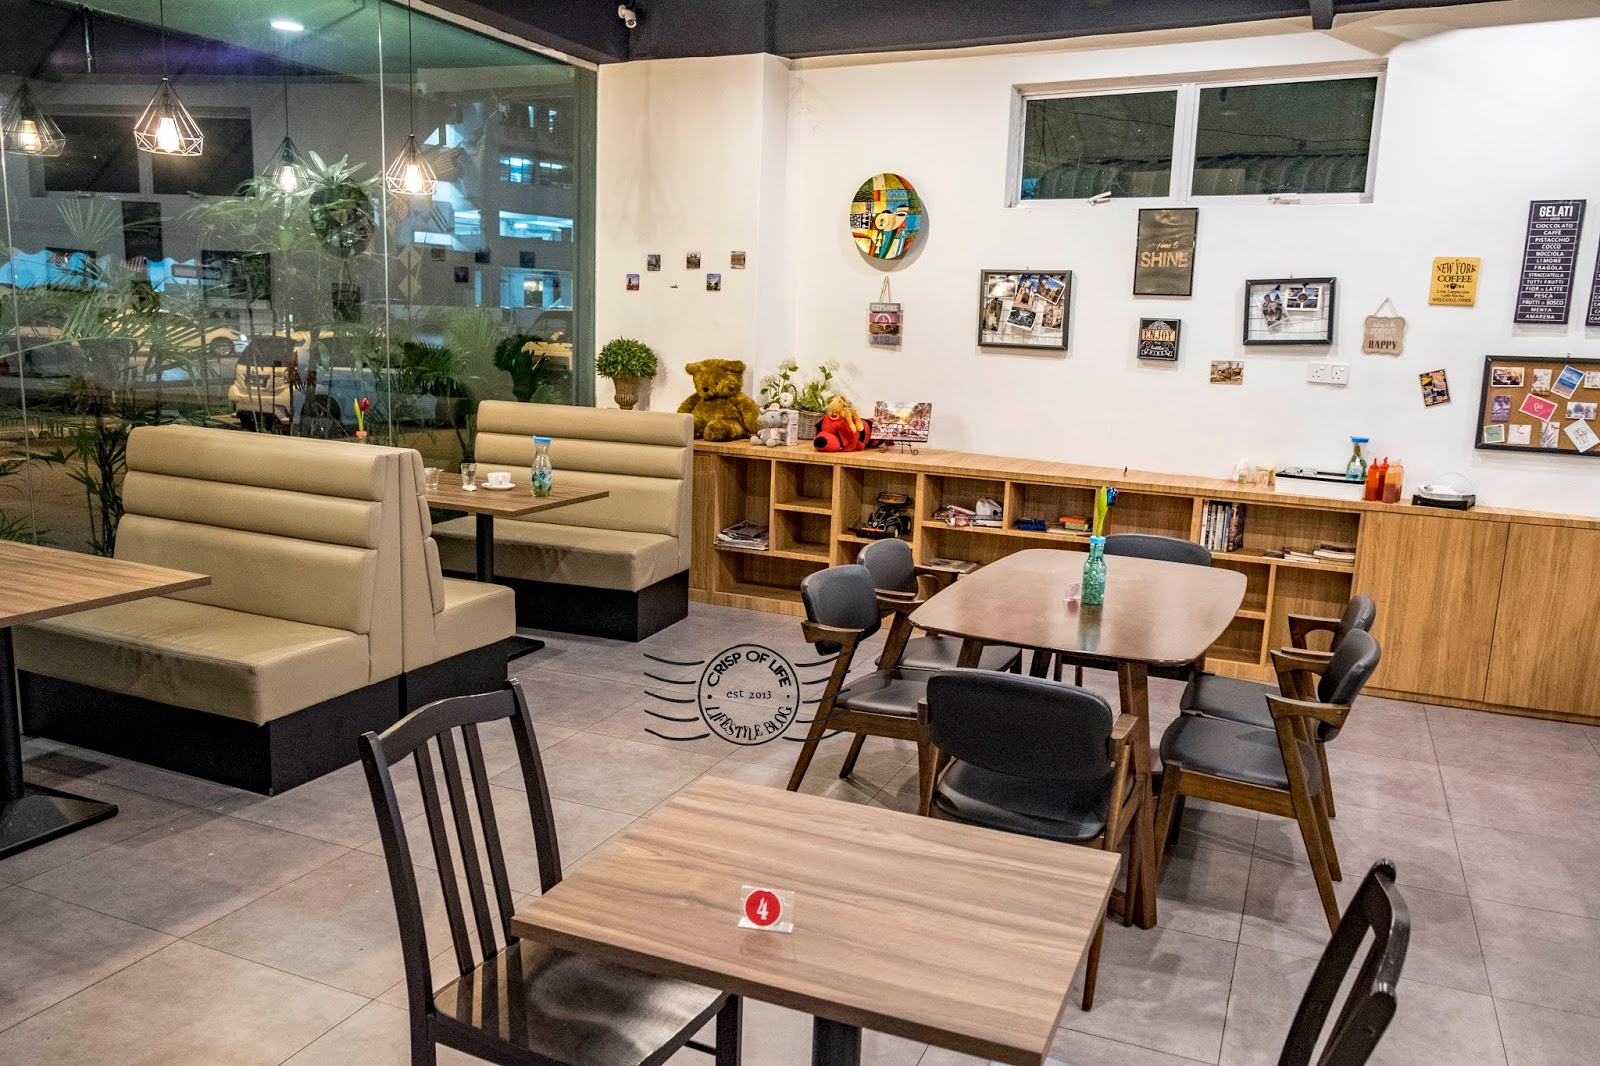 86 Dew Cafe @ Lengkok Perak, Penang